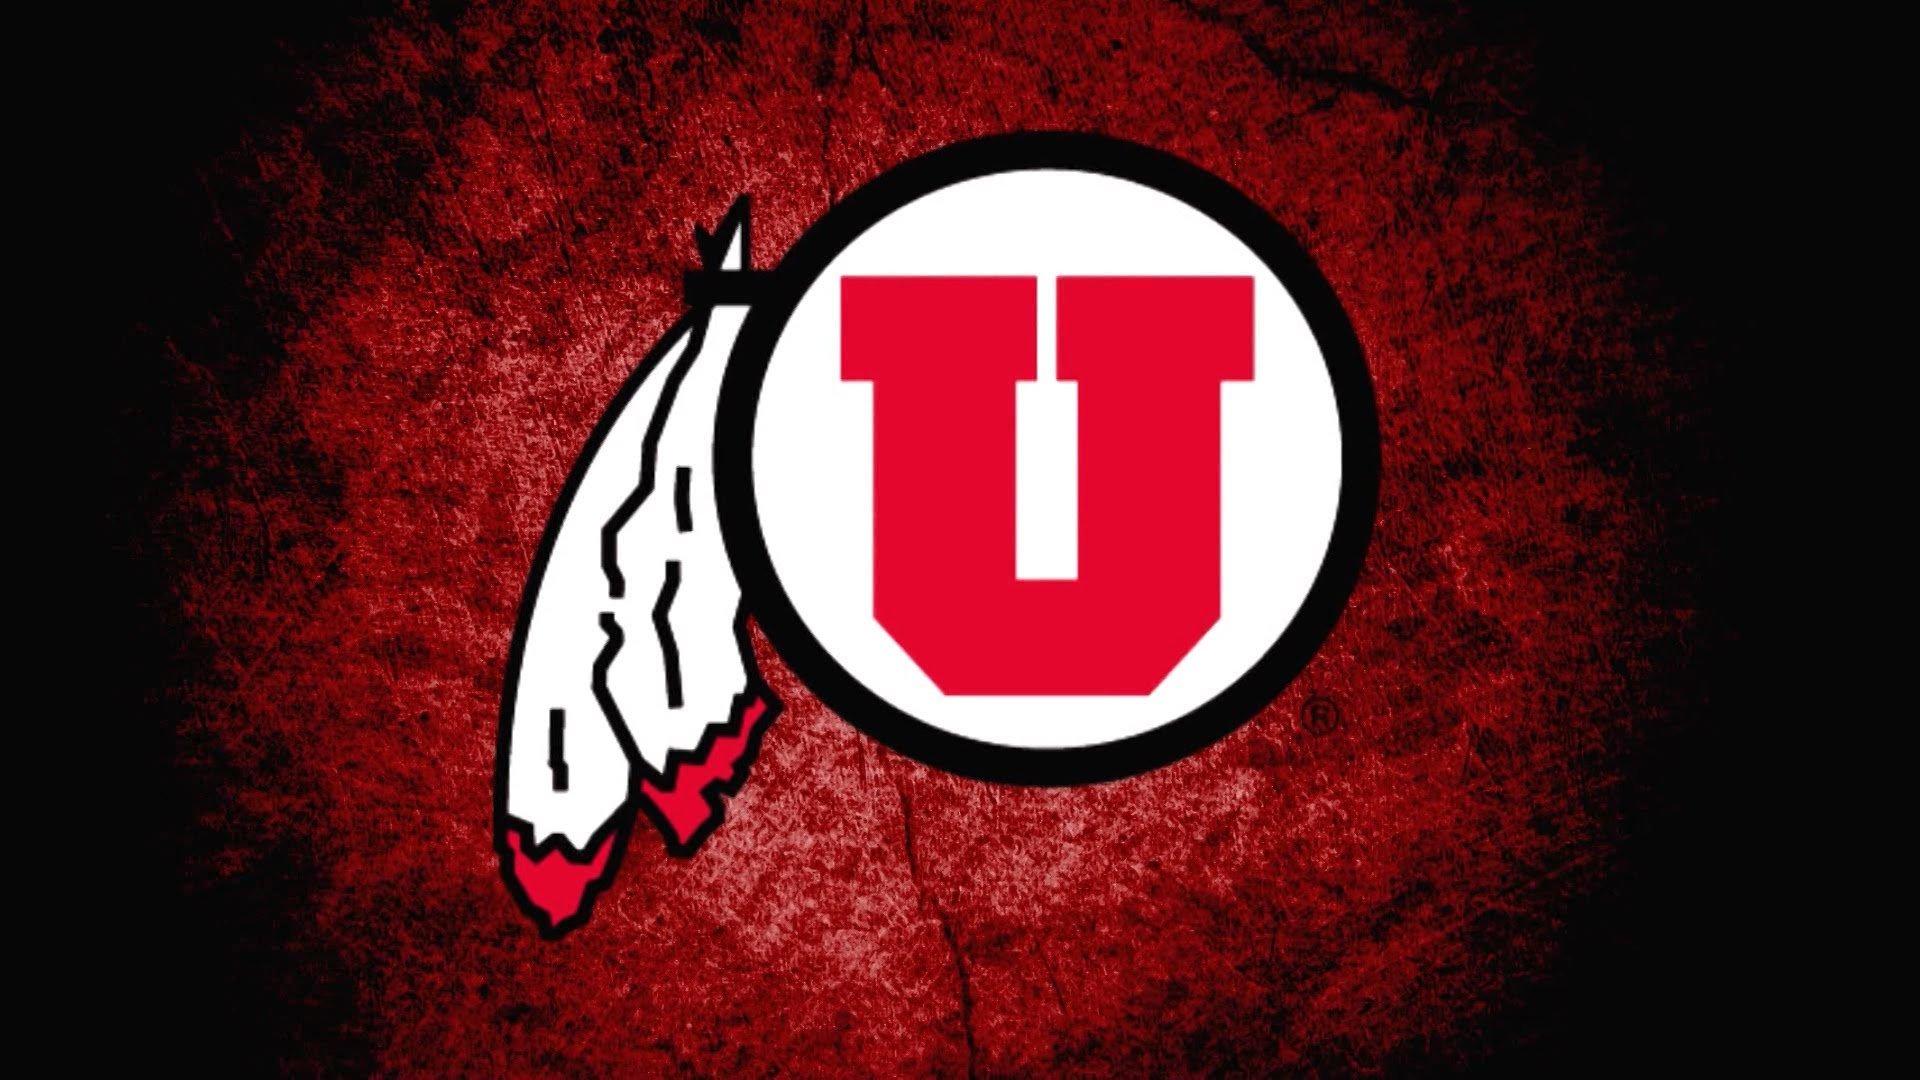 UTAH UTES college football wallpaper 1920x1080 597695 1920x1080